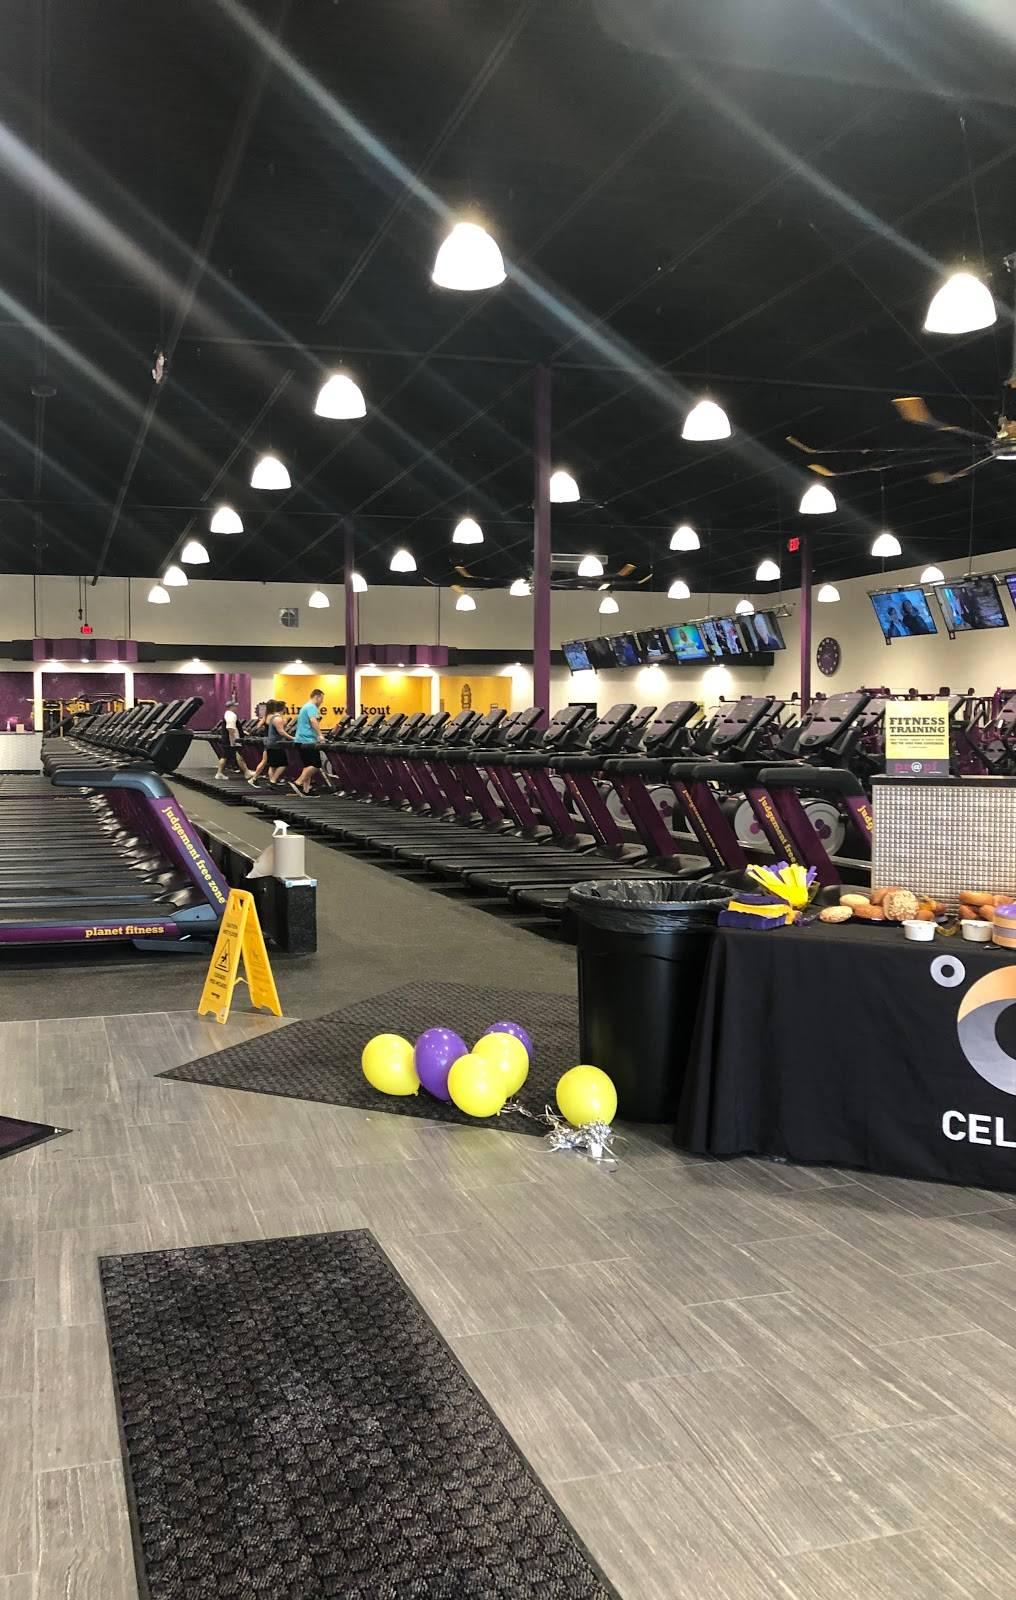 Planet Fitness - gym  | Photo 7 of 9 | Address: 10650 Baltimore St NE, Blaine, MN 55449, USA | Phone: (763) 270-5601